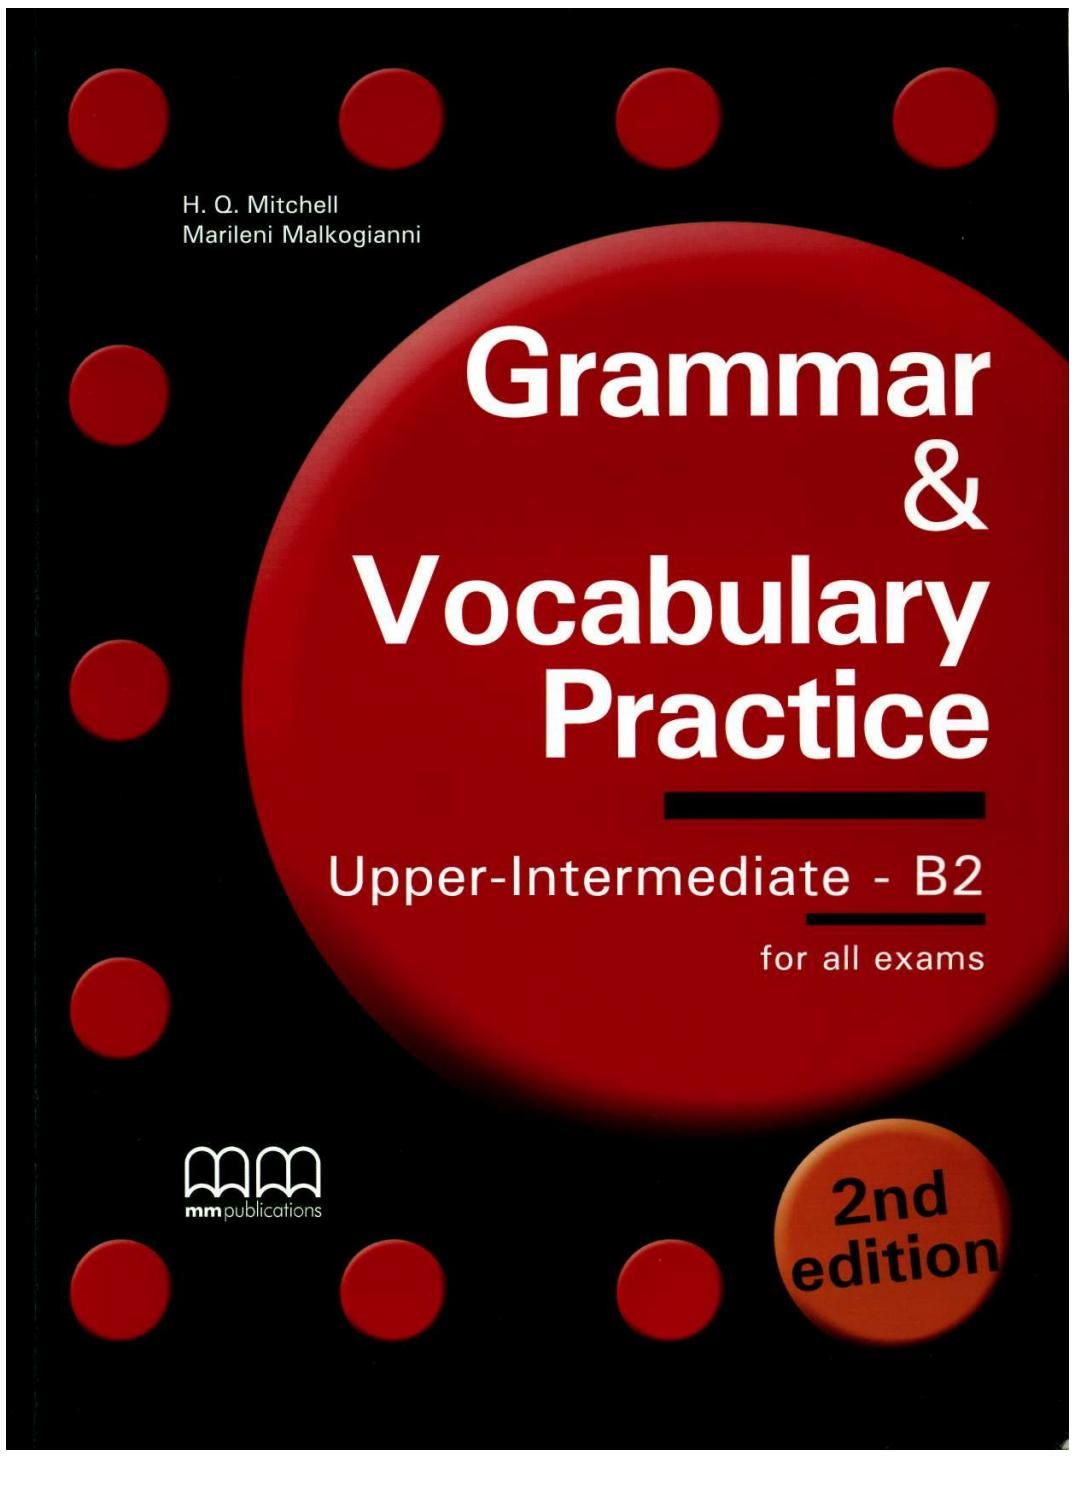 Mm Publications Pioneer British English Language Teaching Language Teaching Teaching Materials